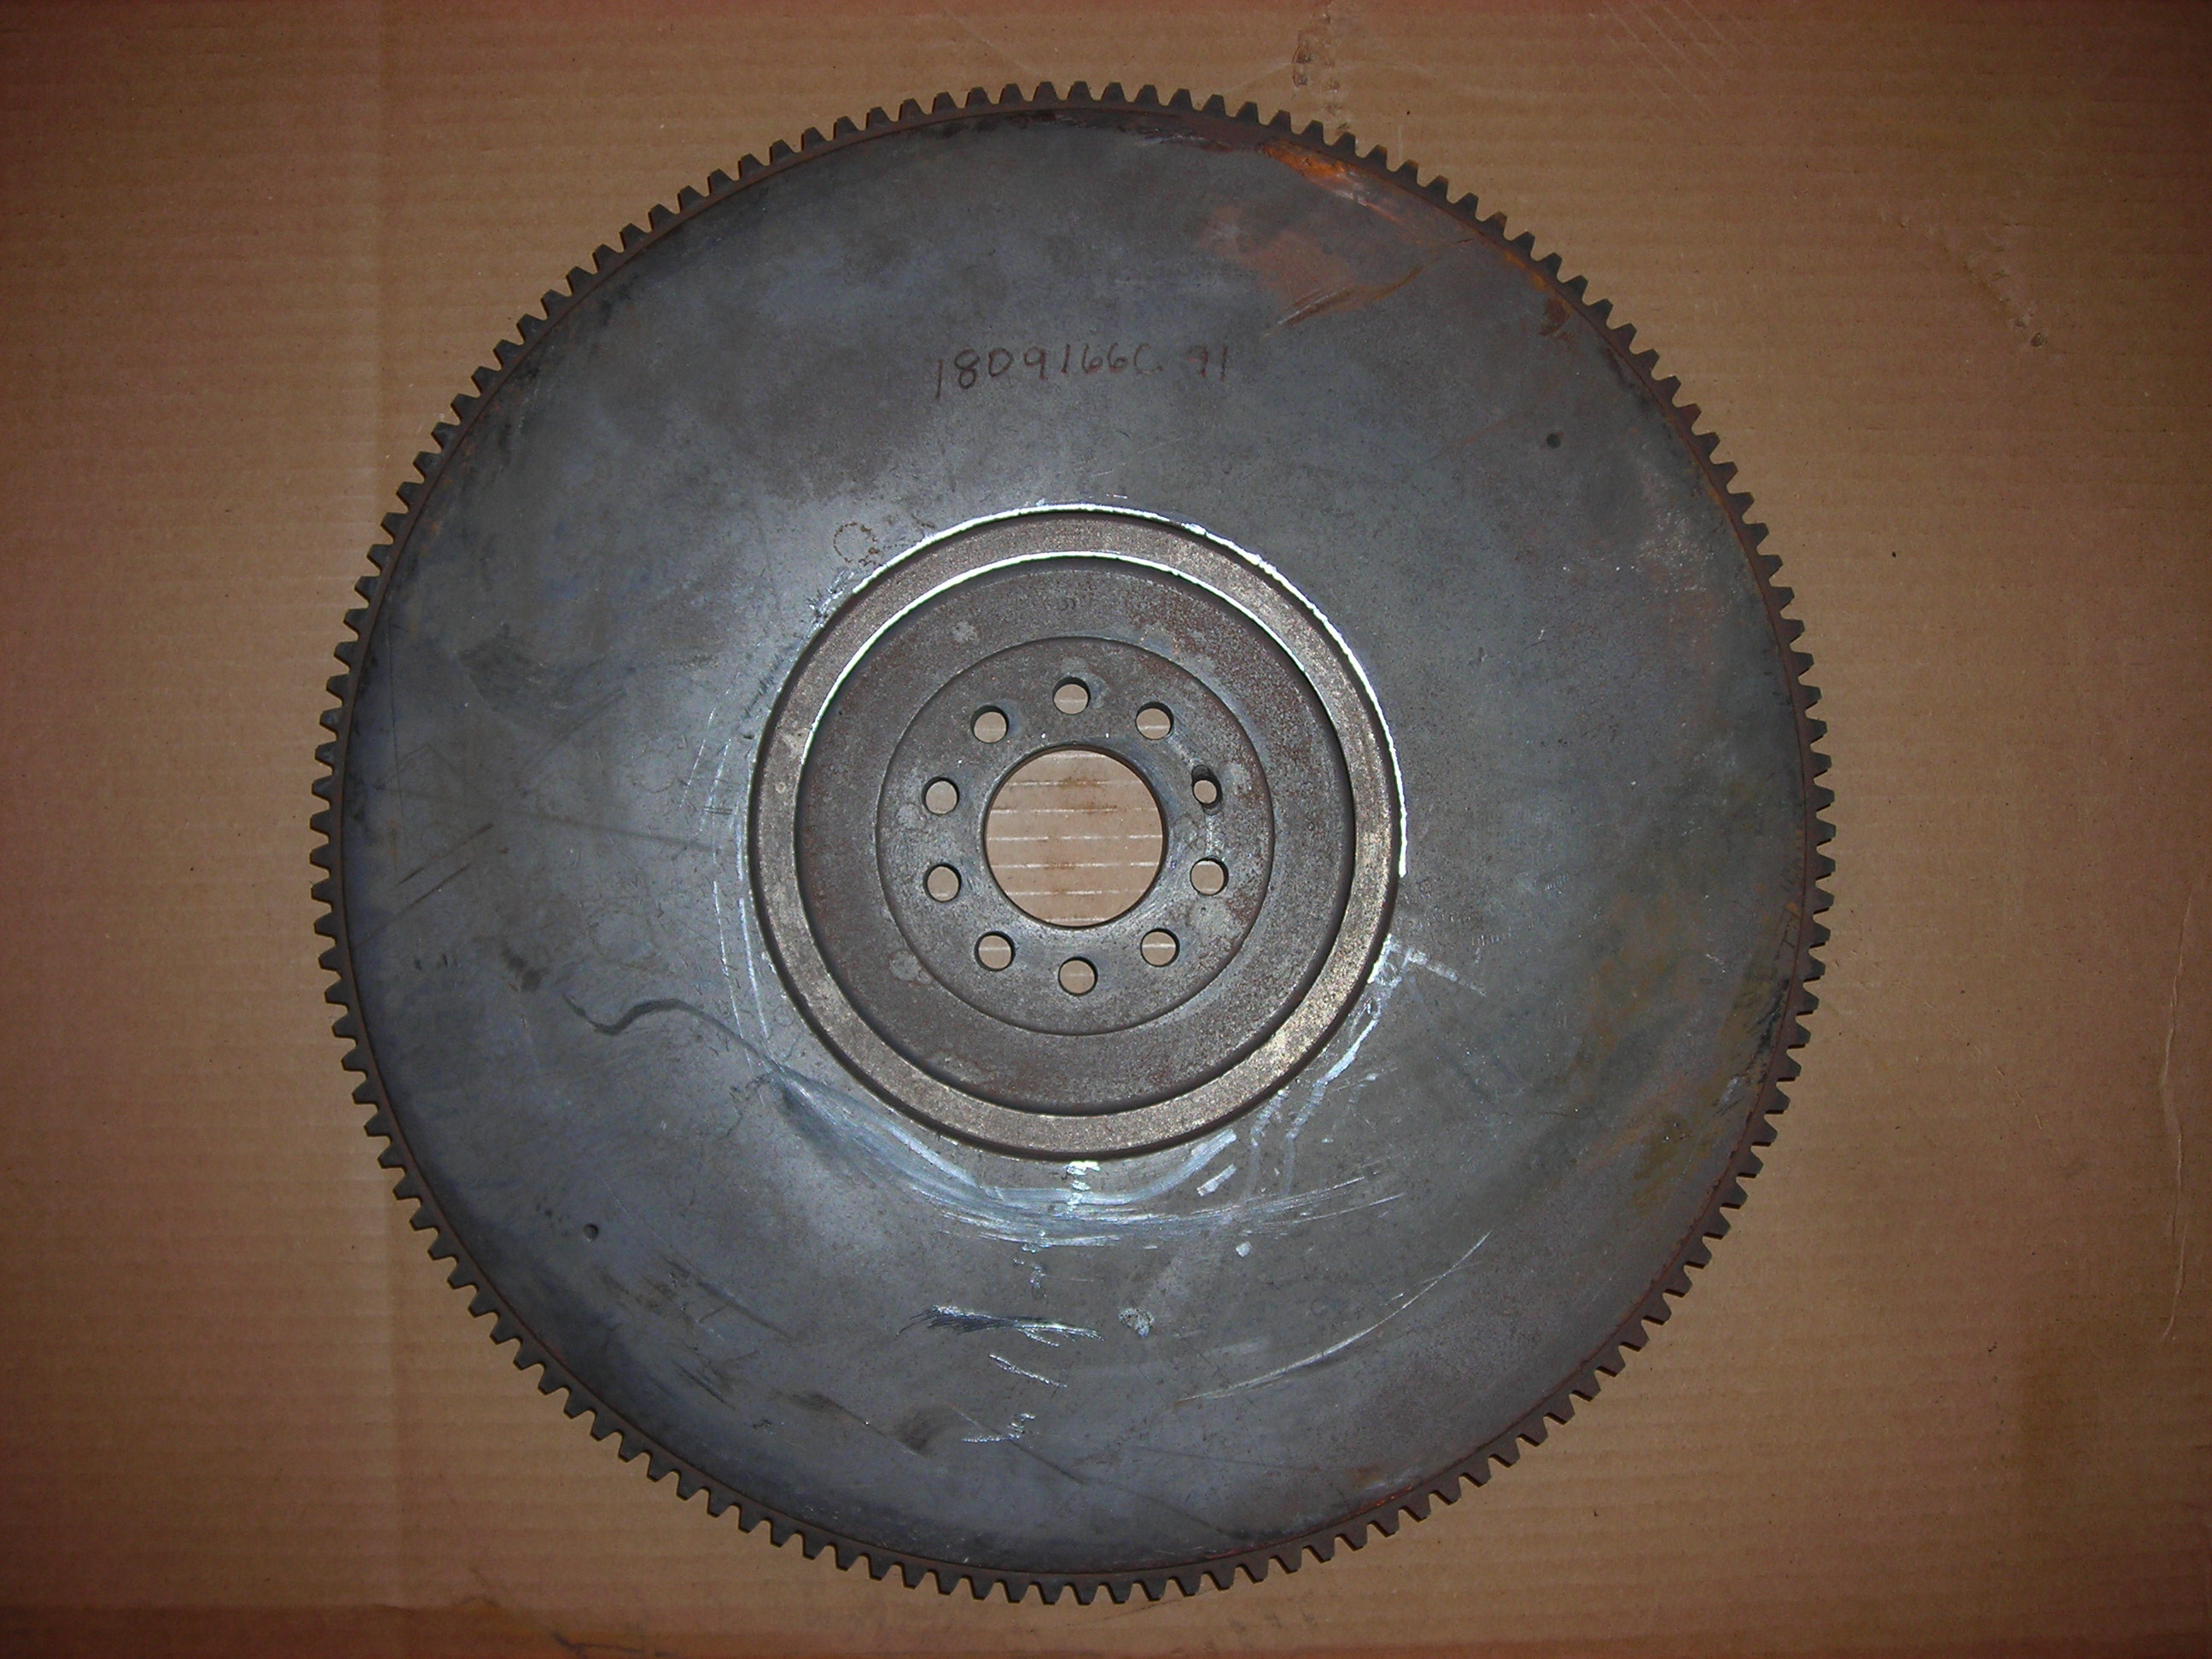 1809166C91 Navistar International Flywheel Front